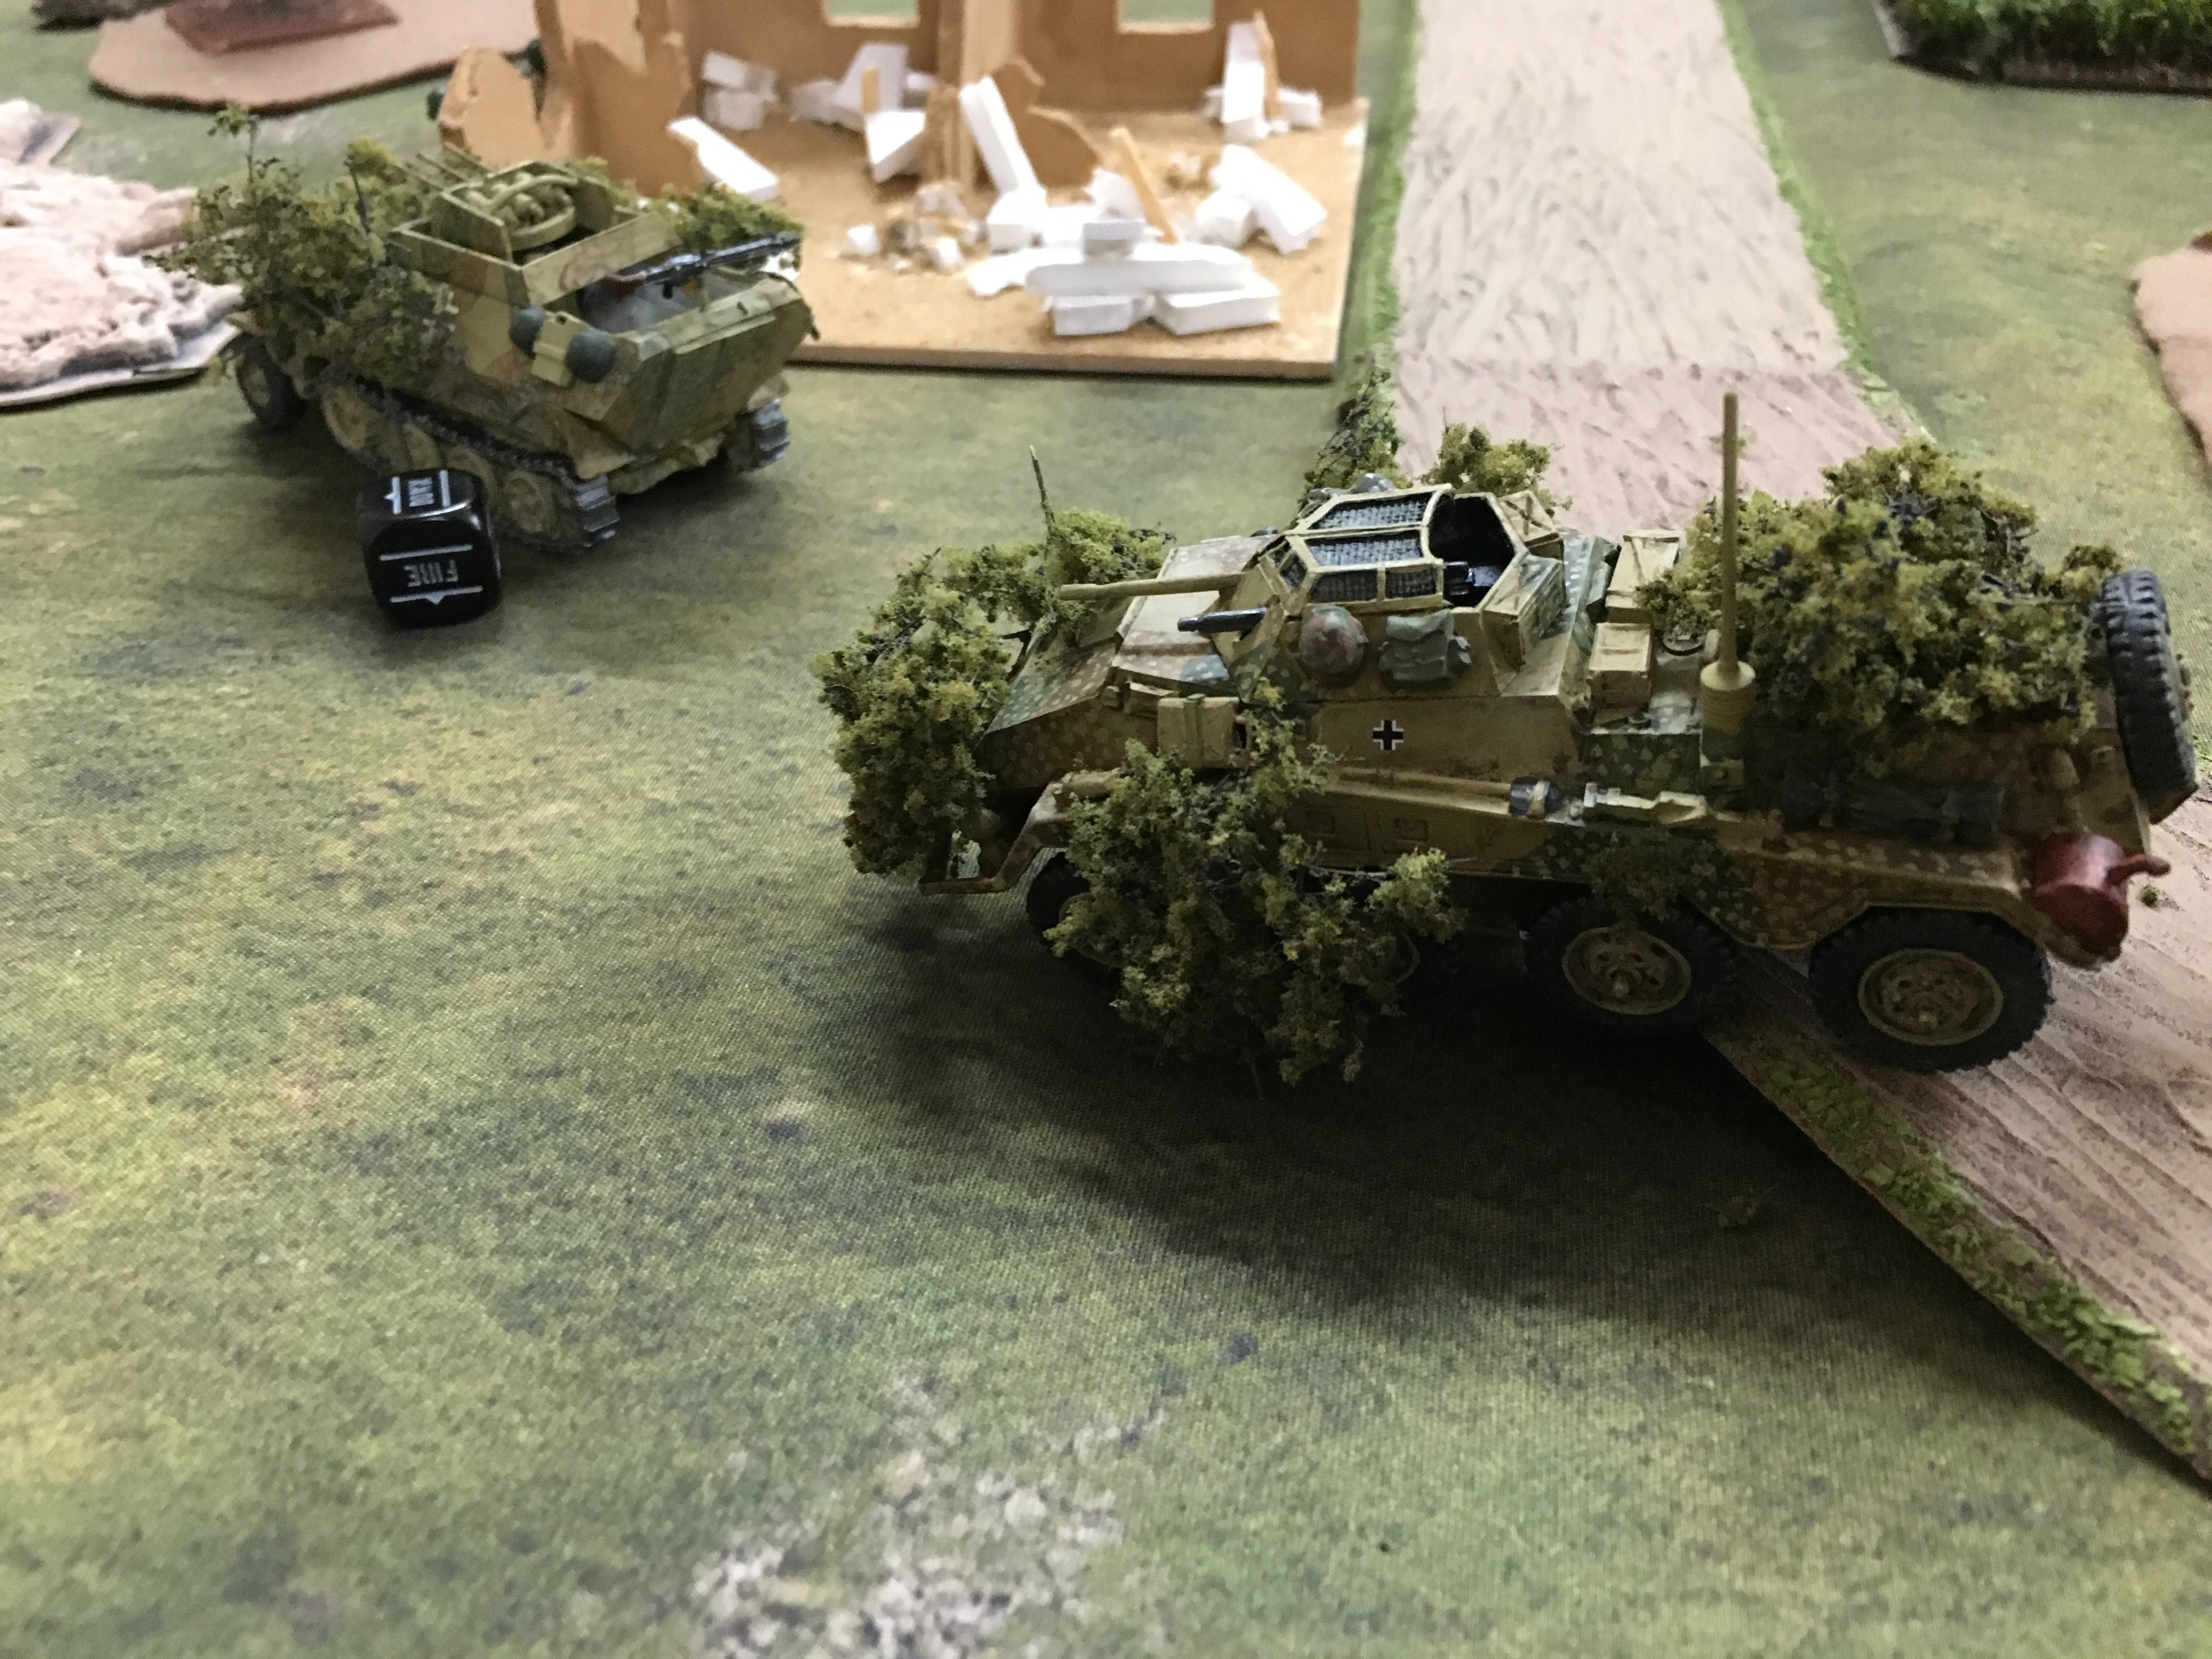 German grenadier's versus Alpha co in a fierce infantry engagement